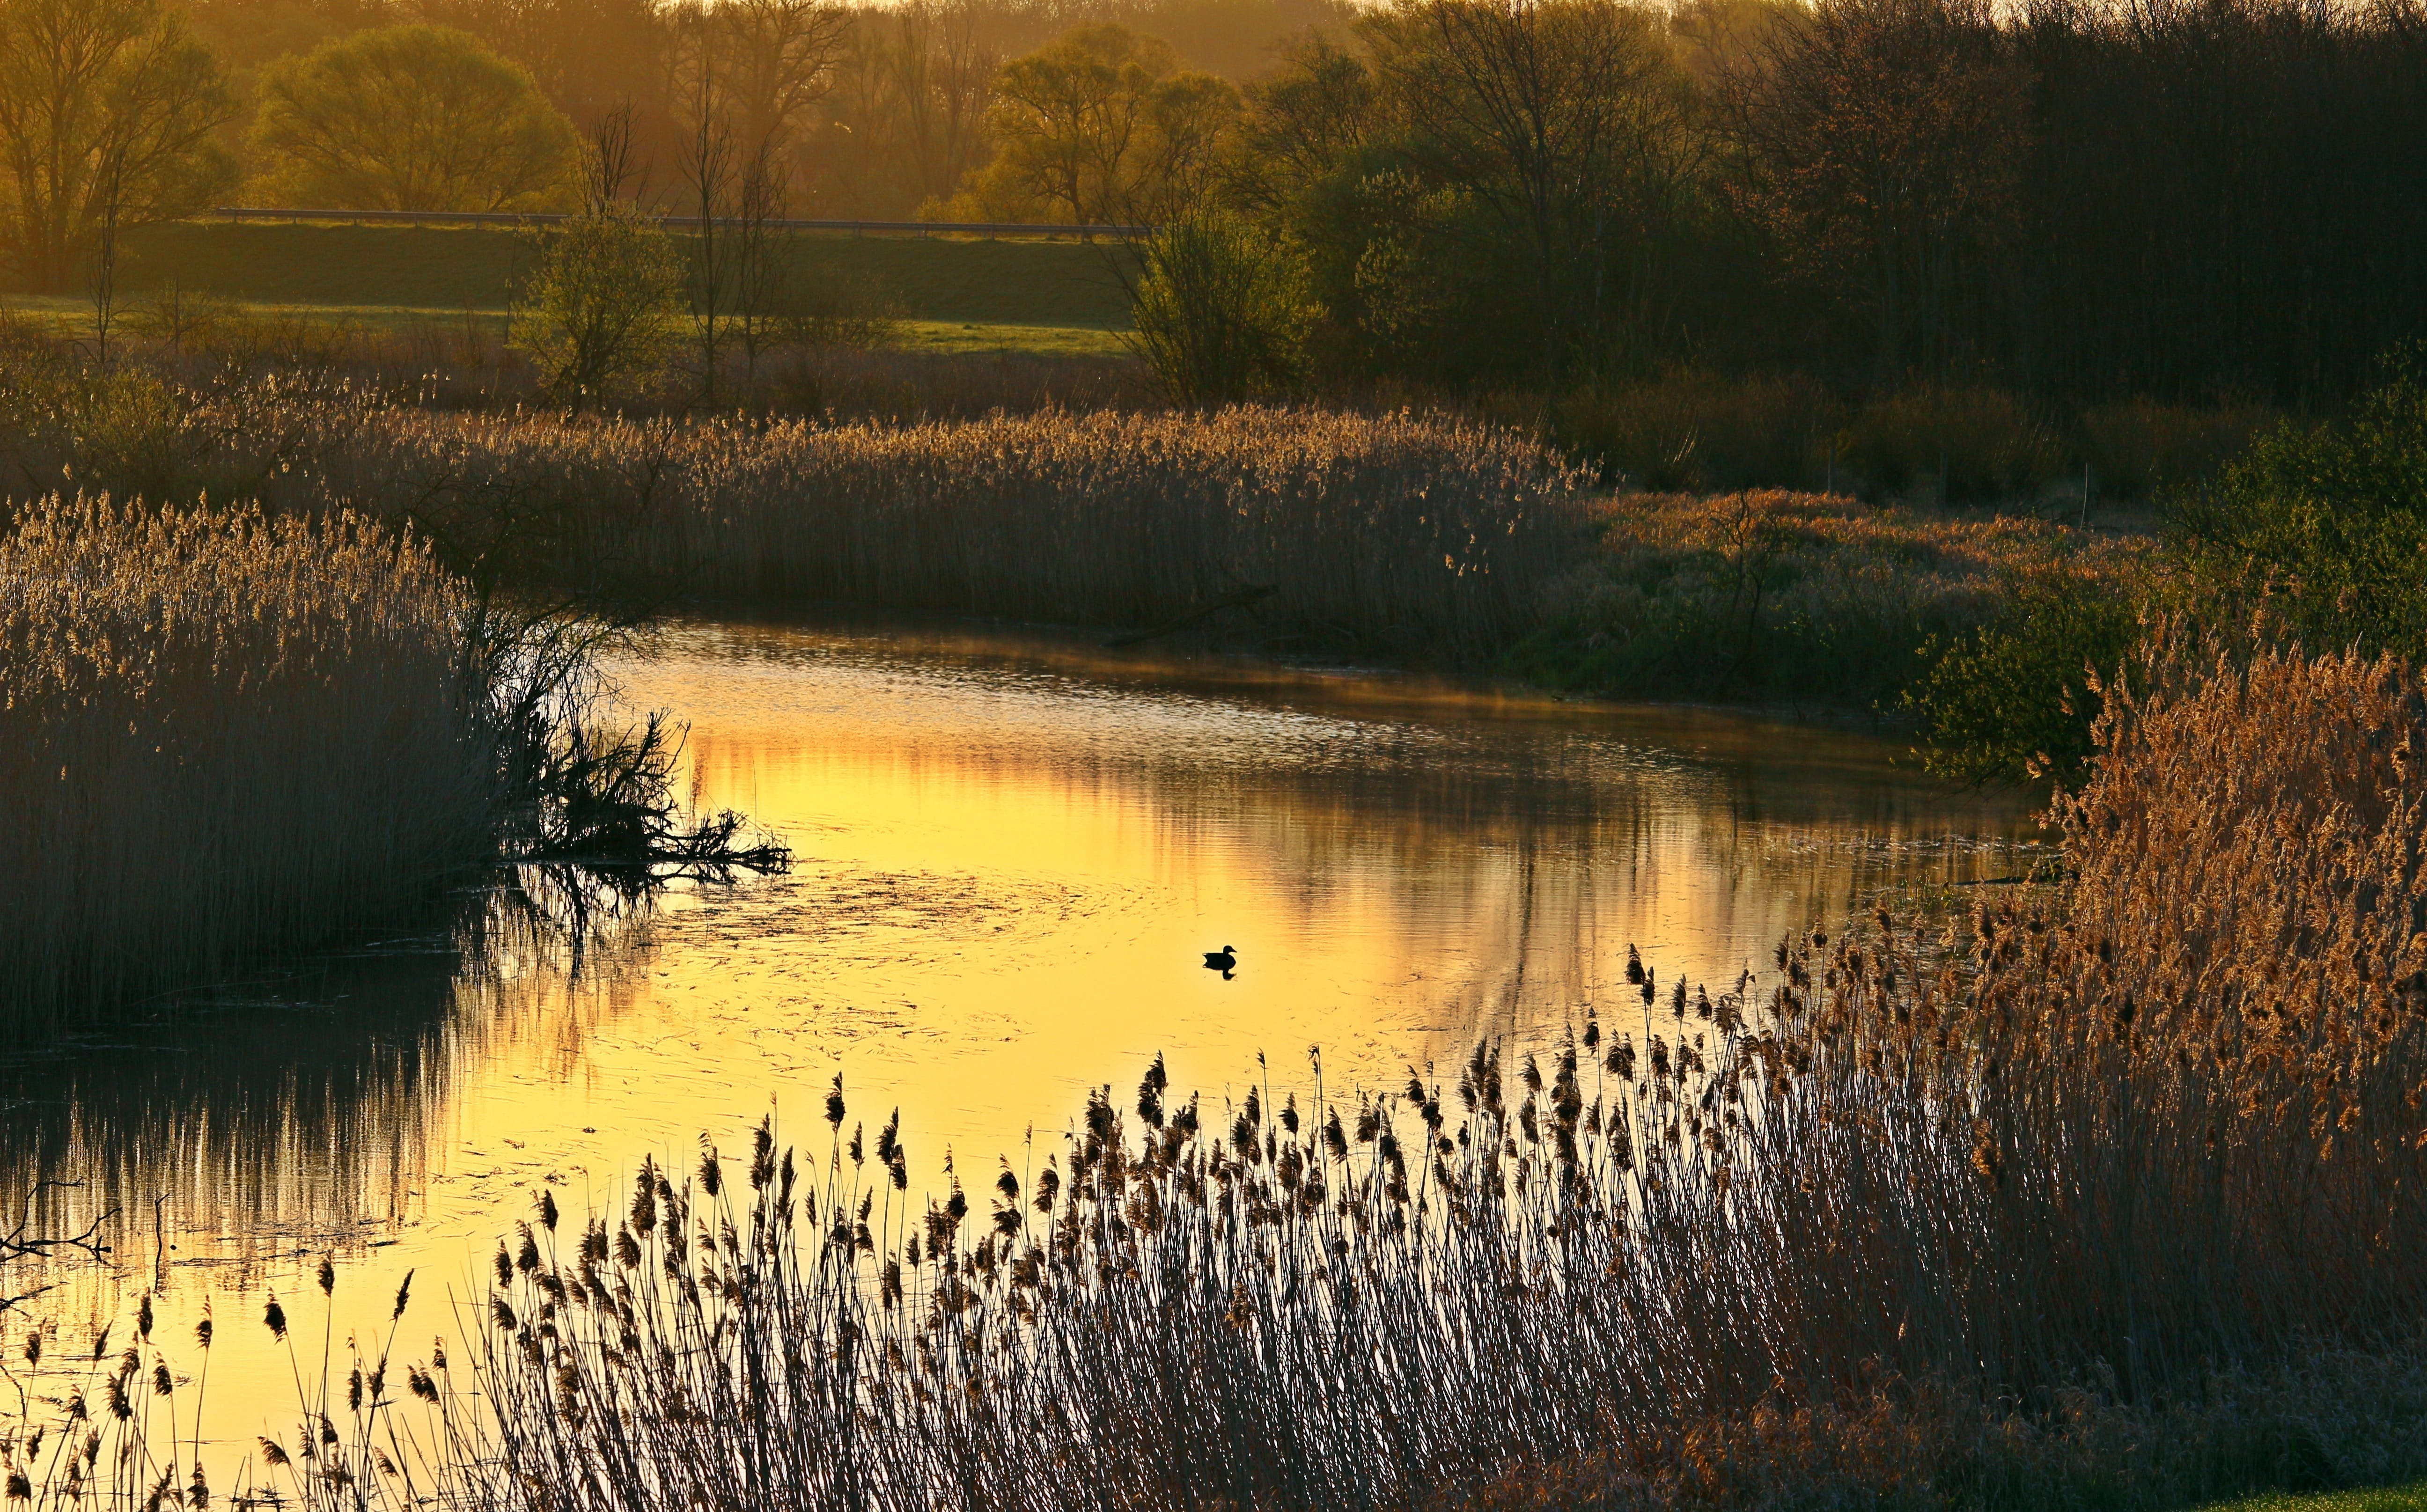 Flowing Water in a Riverside Near Brown Grass